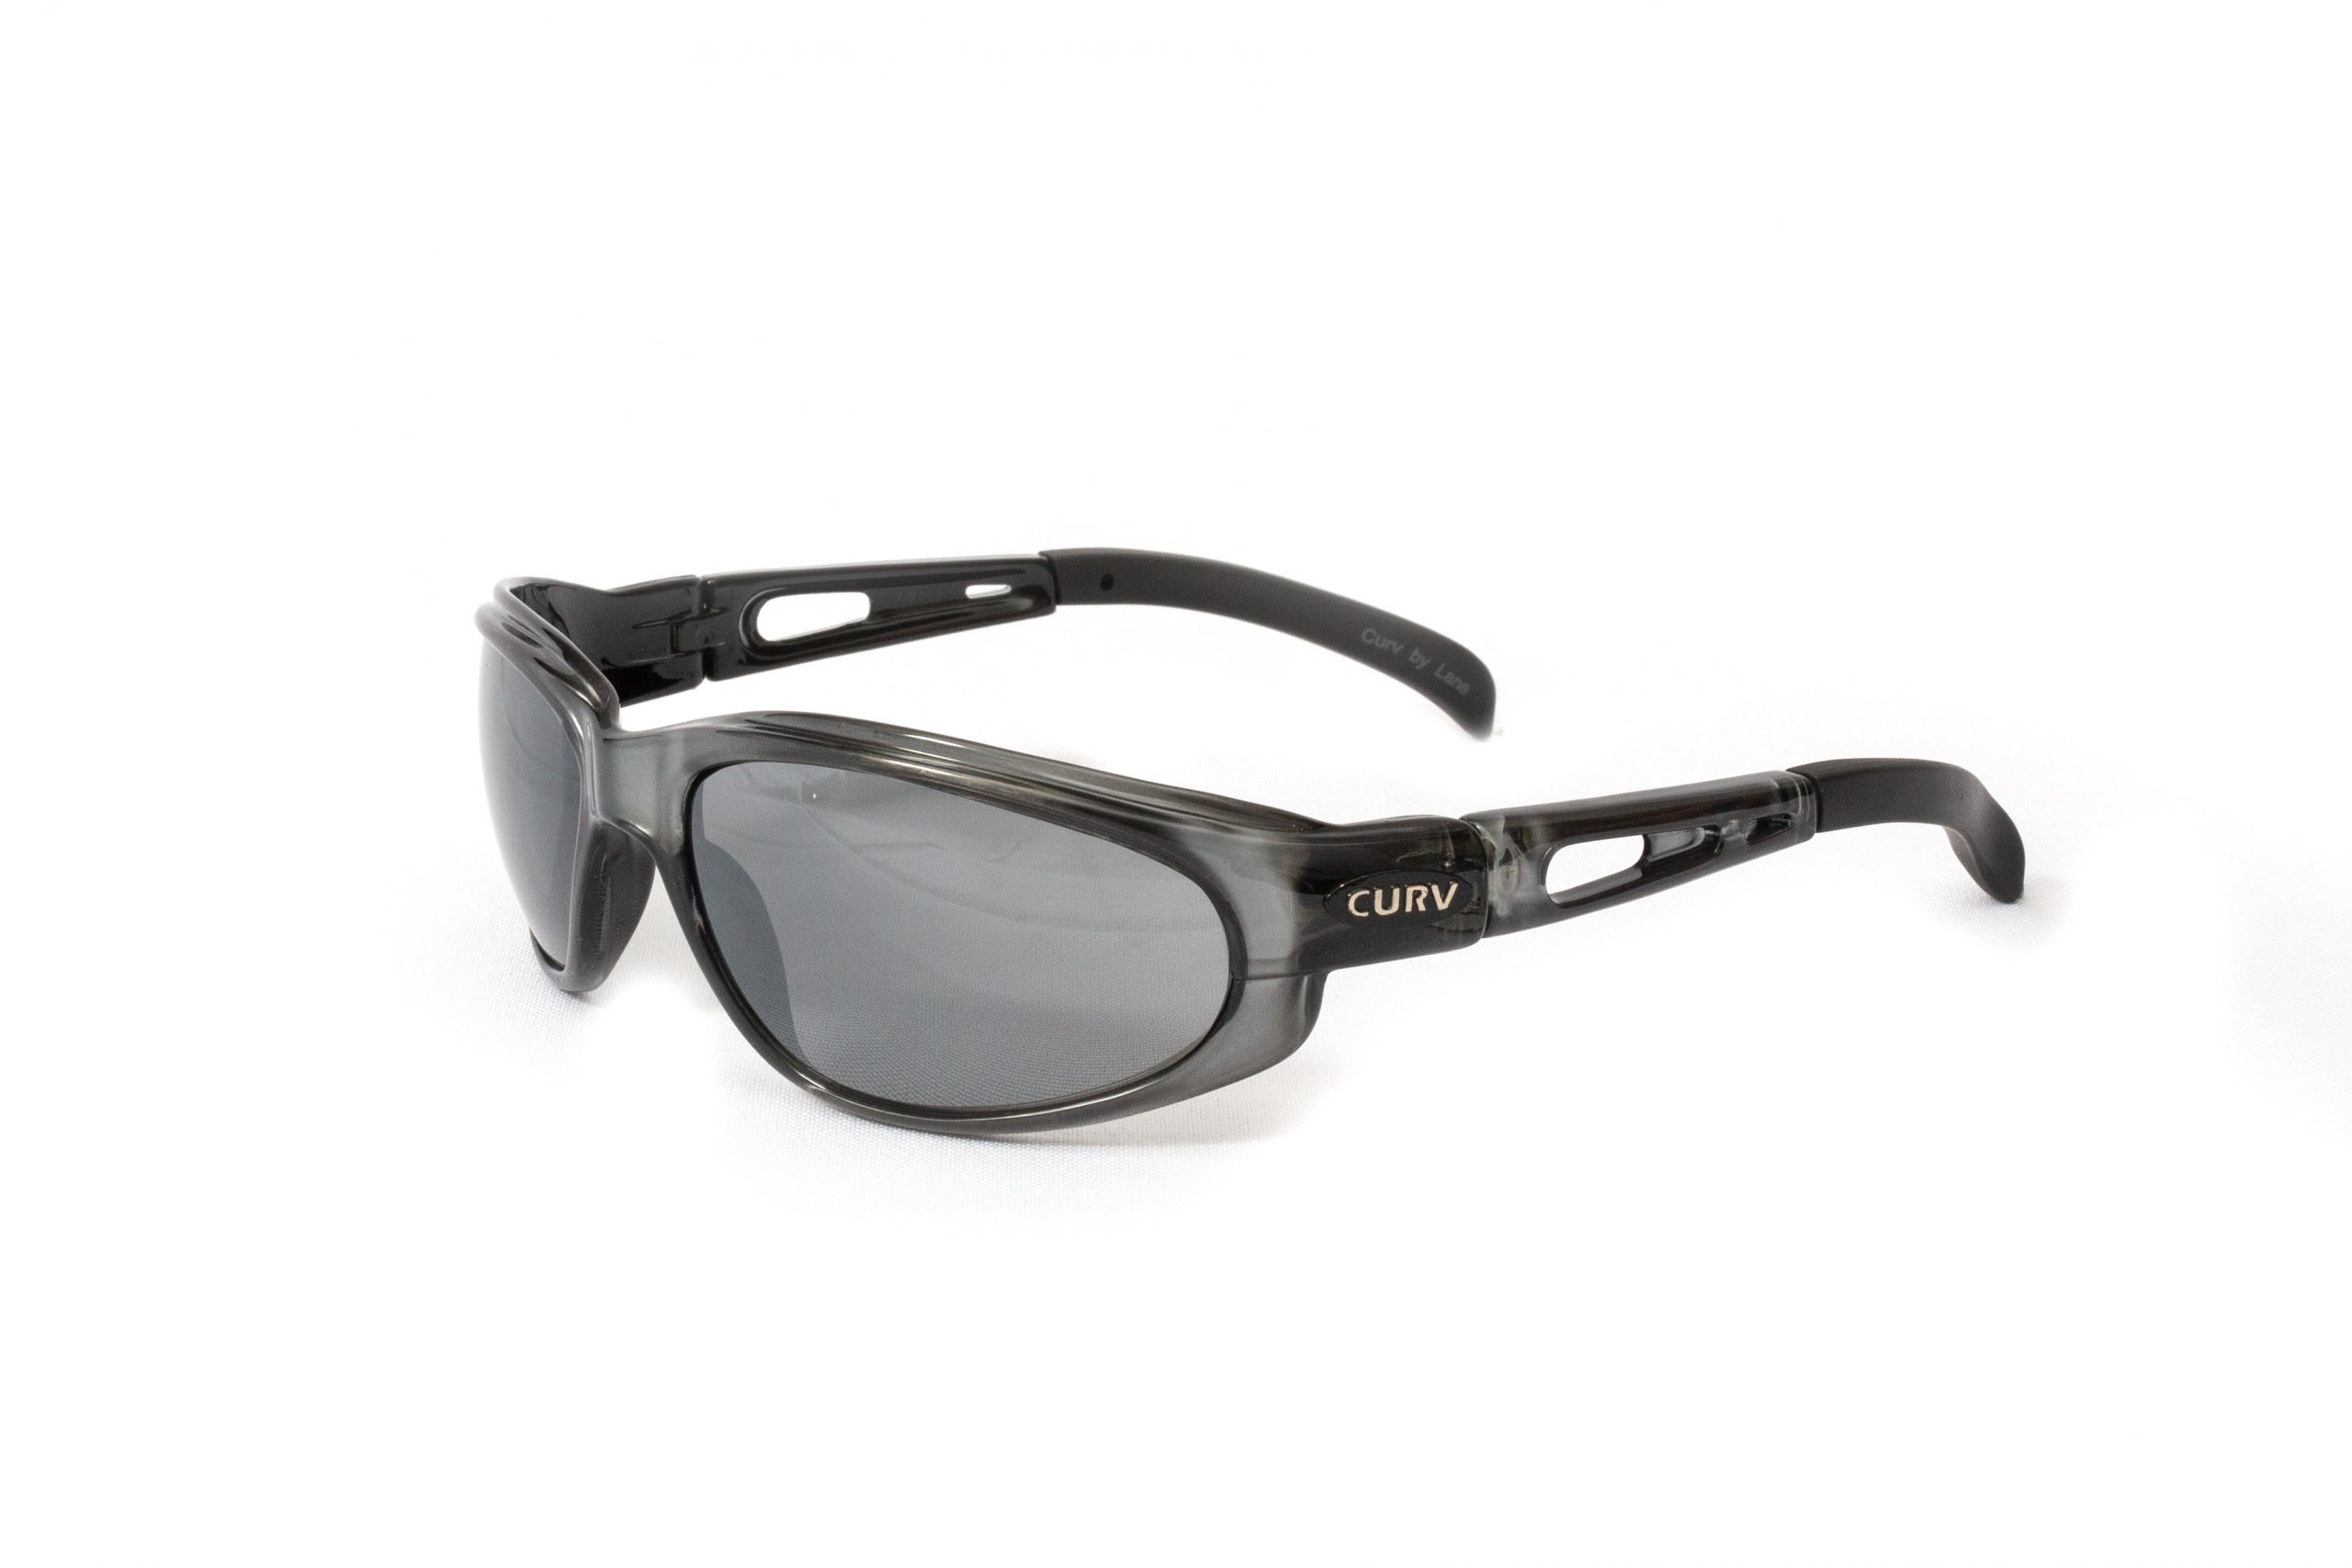 01-29 - Curv Crystal Grey Sunglasses with Flash Mirror Smoke Lenses and Crystal Grey Frames